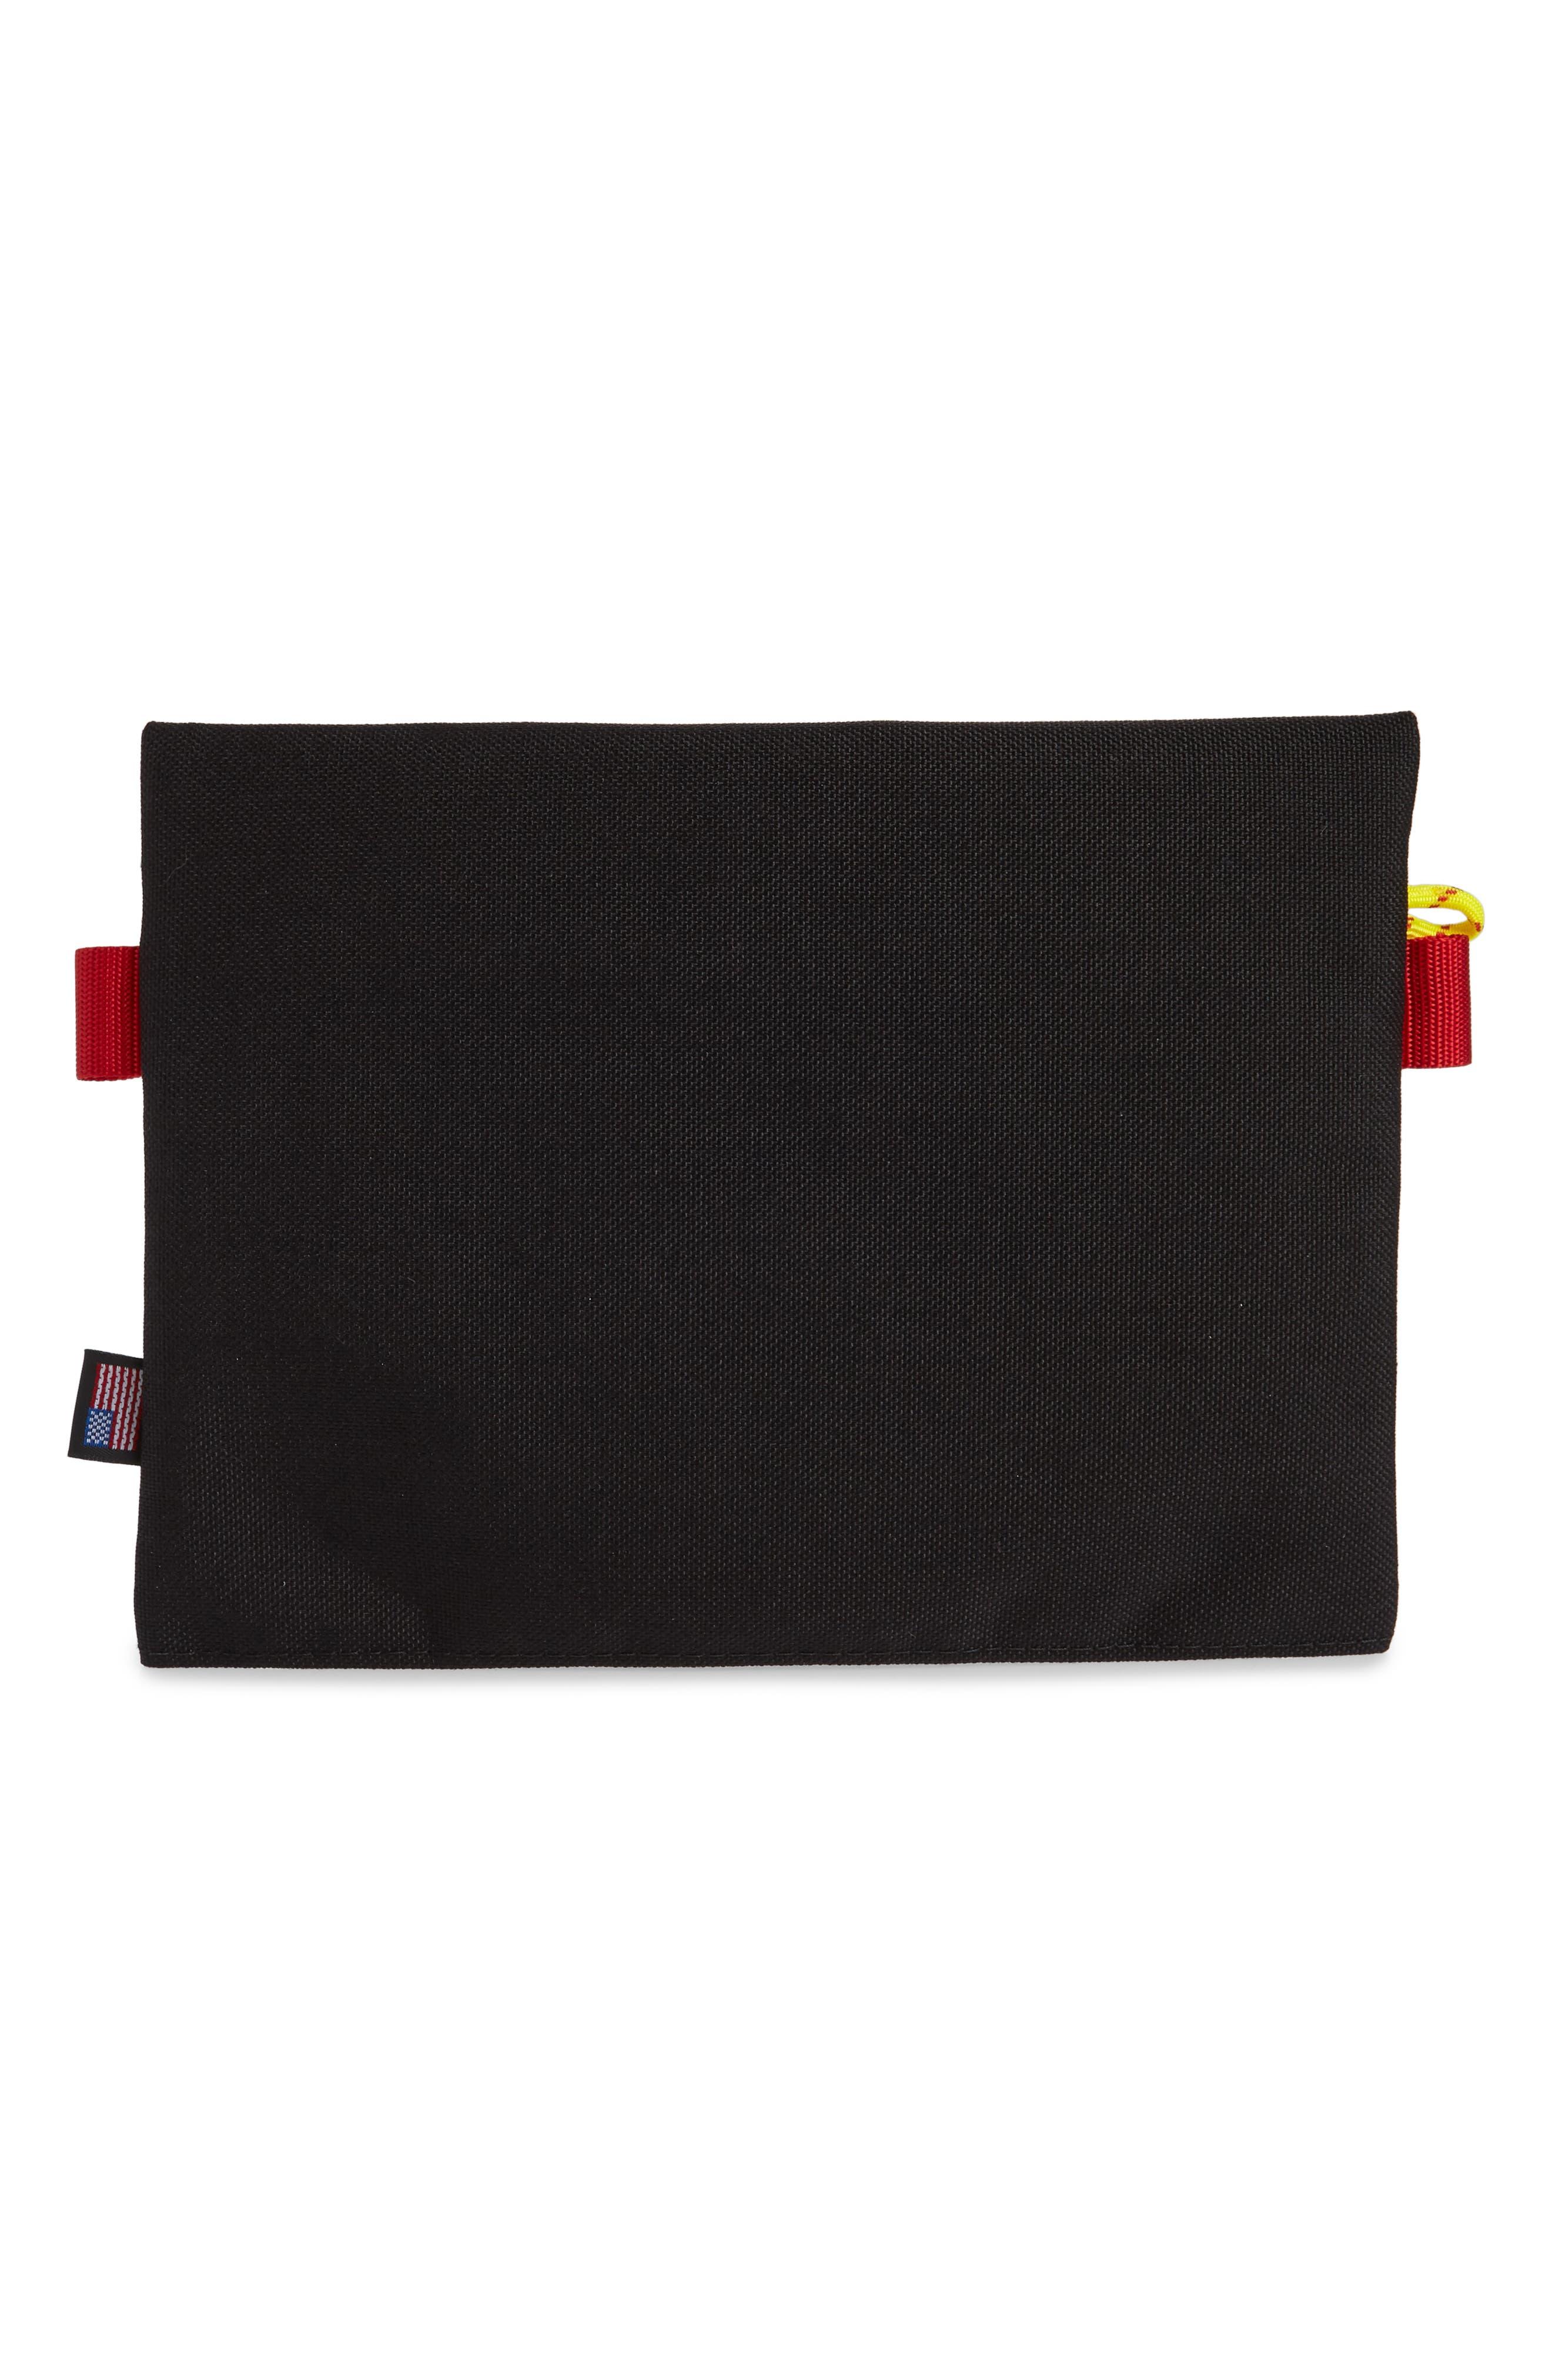 TopoDesigns Accessory Bag,                             Alternate thumbnail 2, color,                             BLACK/ ROYAL